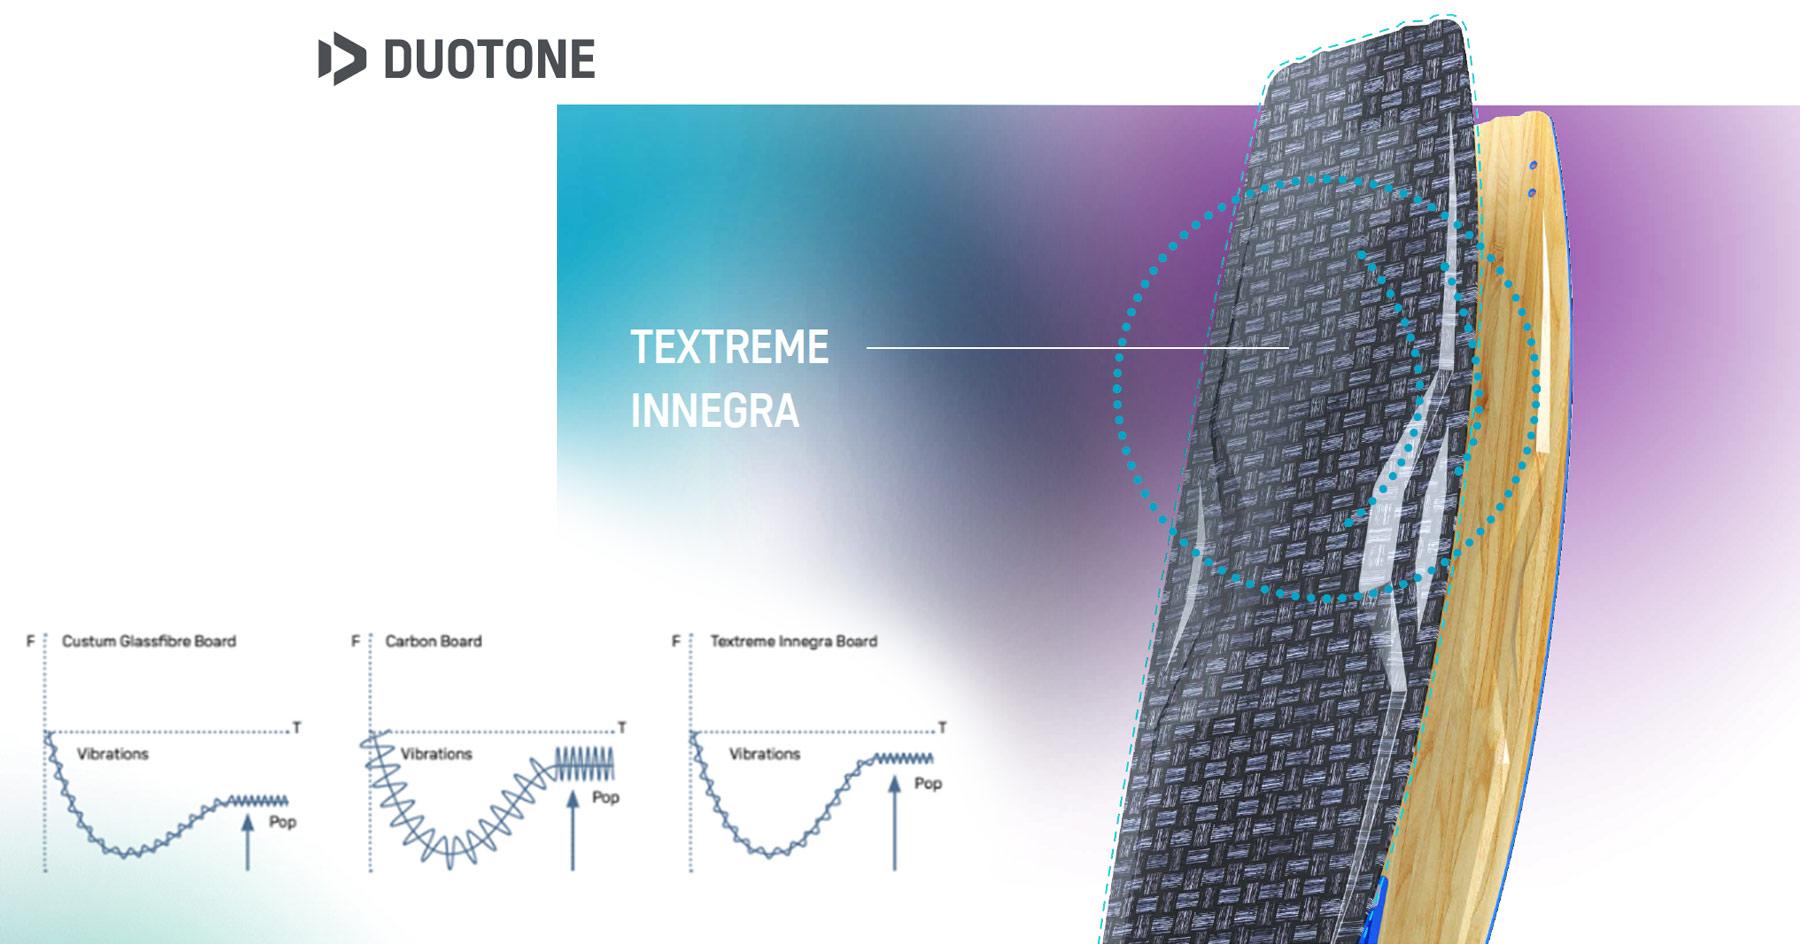 Nouvelle construction TEXTREM innegra 2021 sls duotone kiteboarding